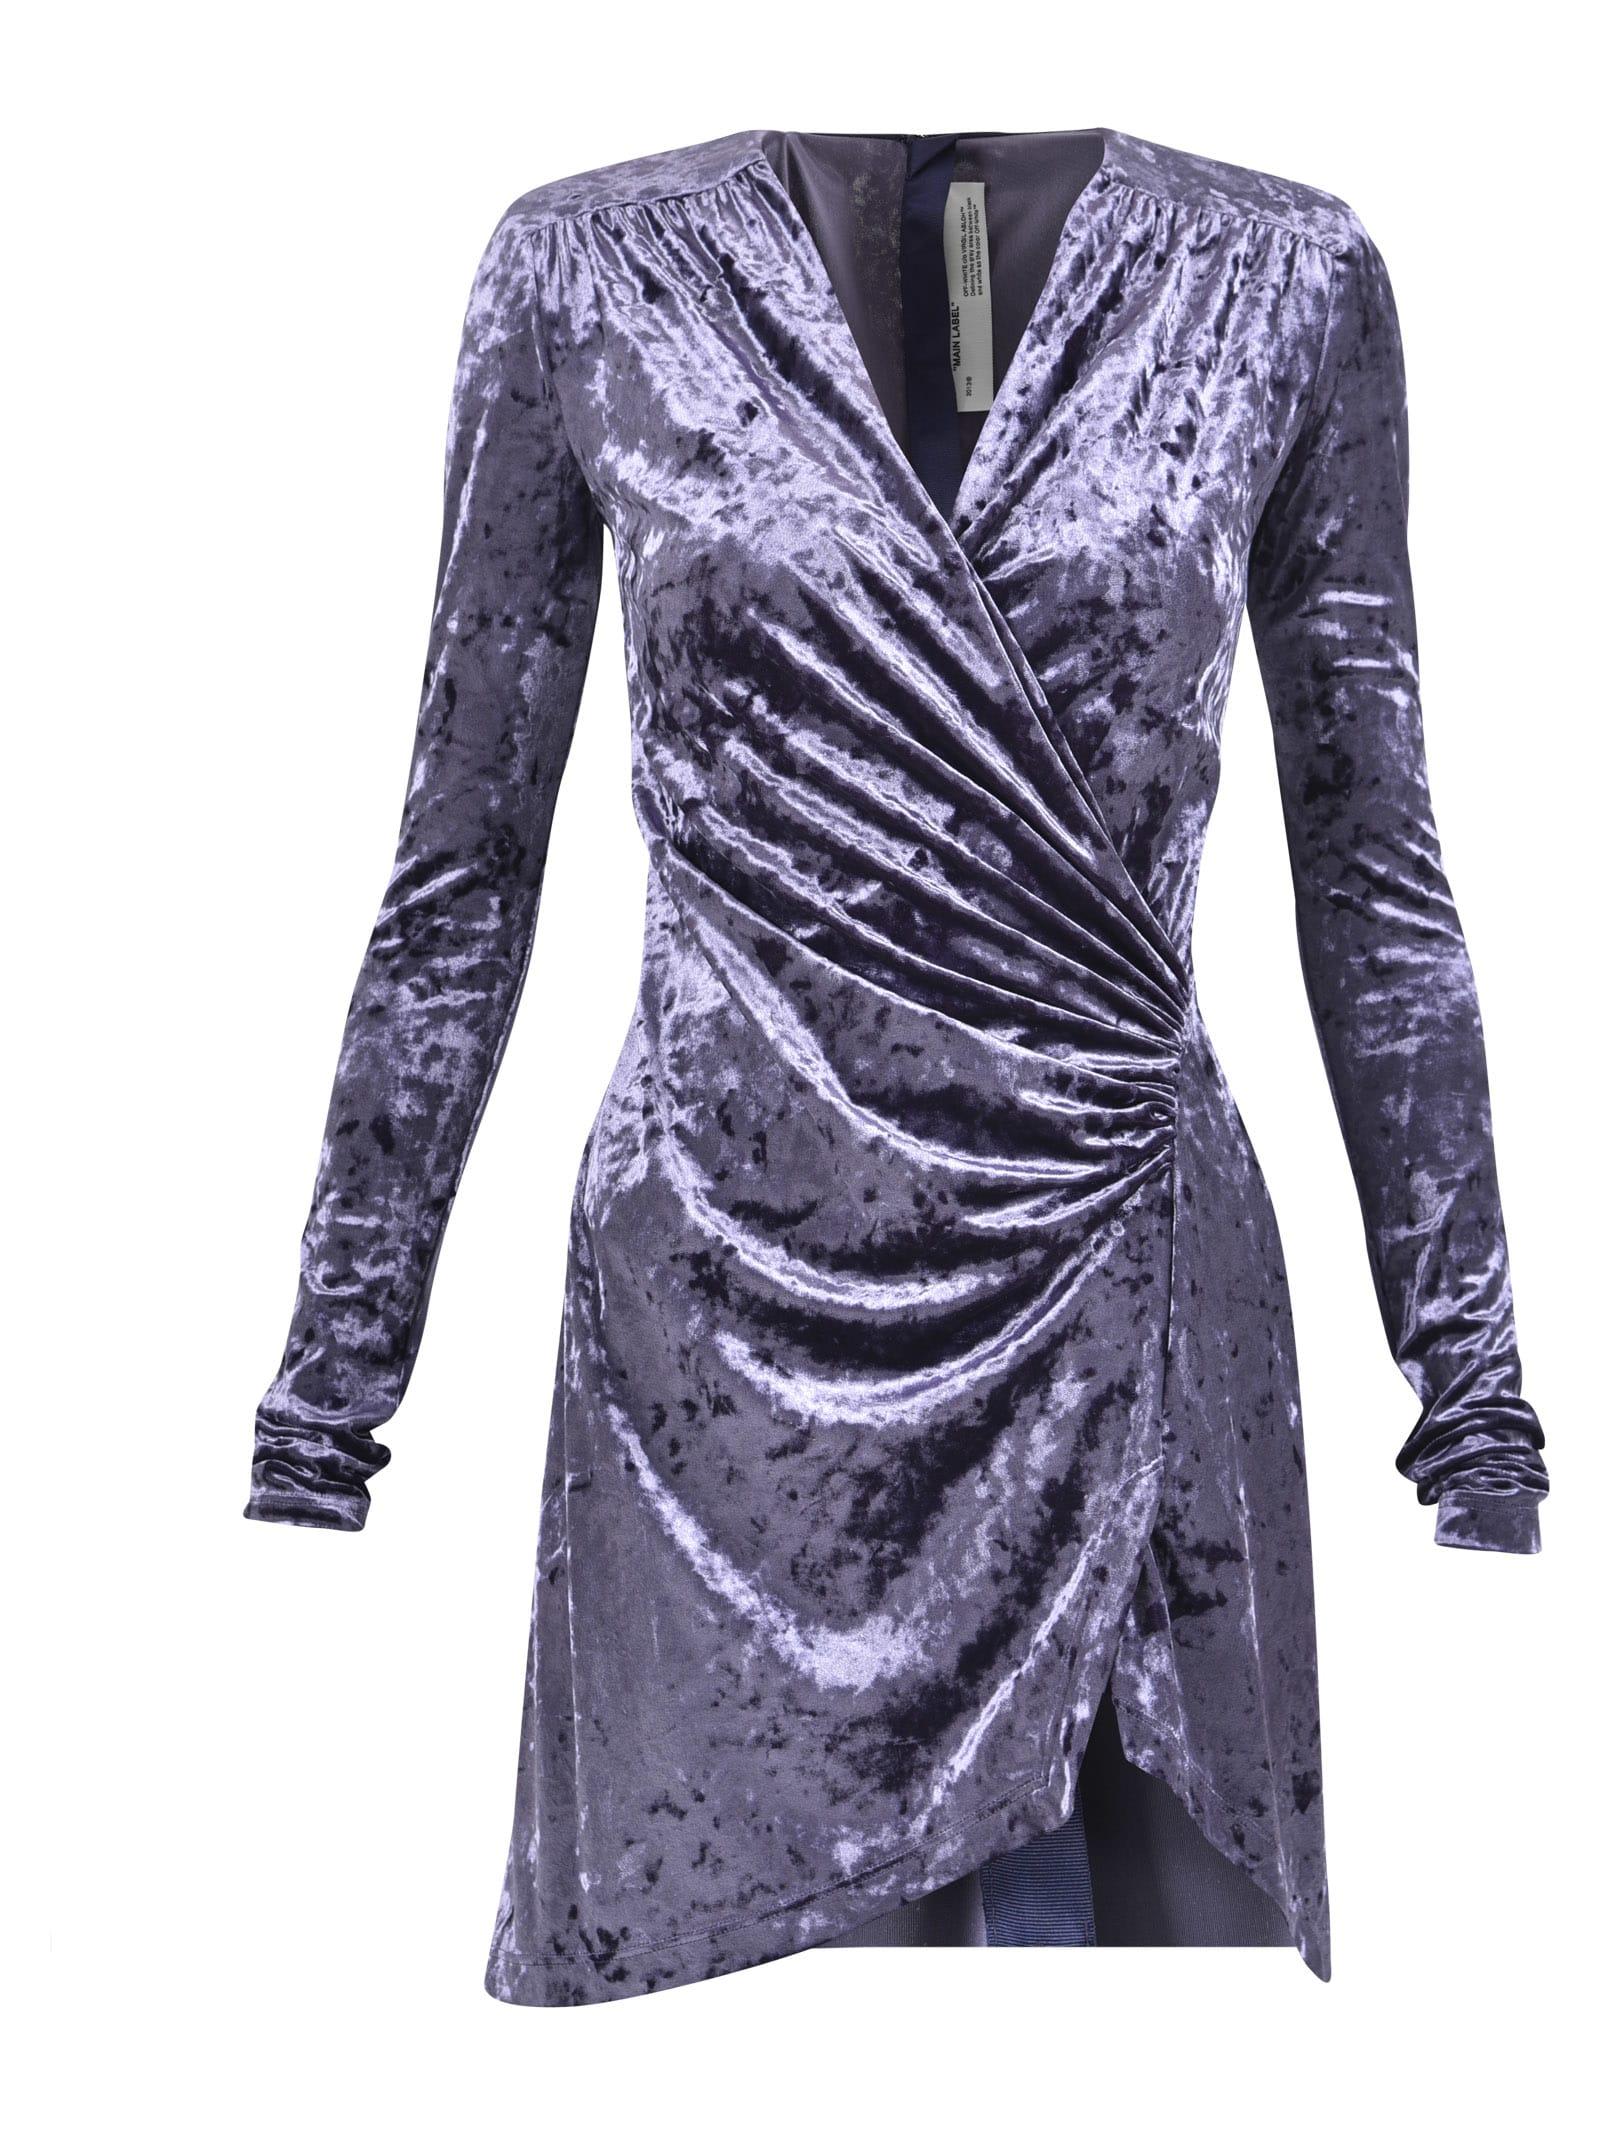 Off-White Draped Dress